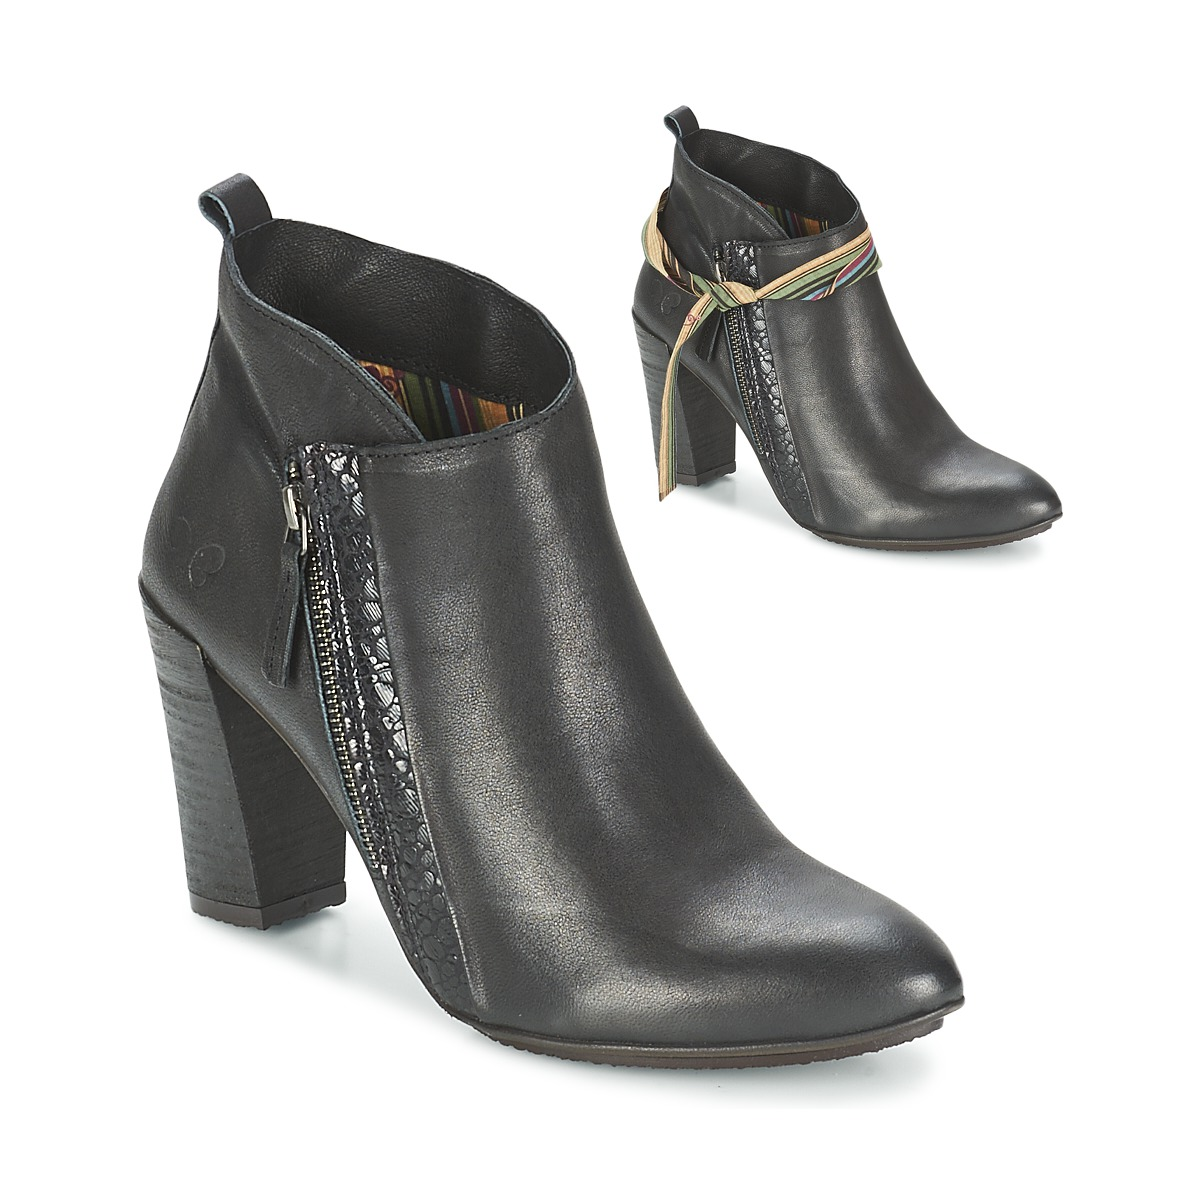 Felmini CASSANDRE Schwarz - Kostenloser Versand bei Spartoode ! - Schuhe Low Boots Damen 83,90 €